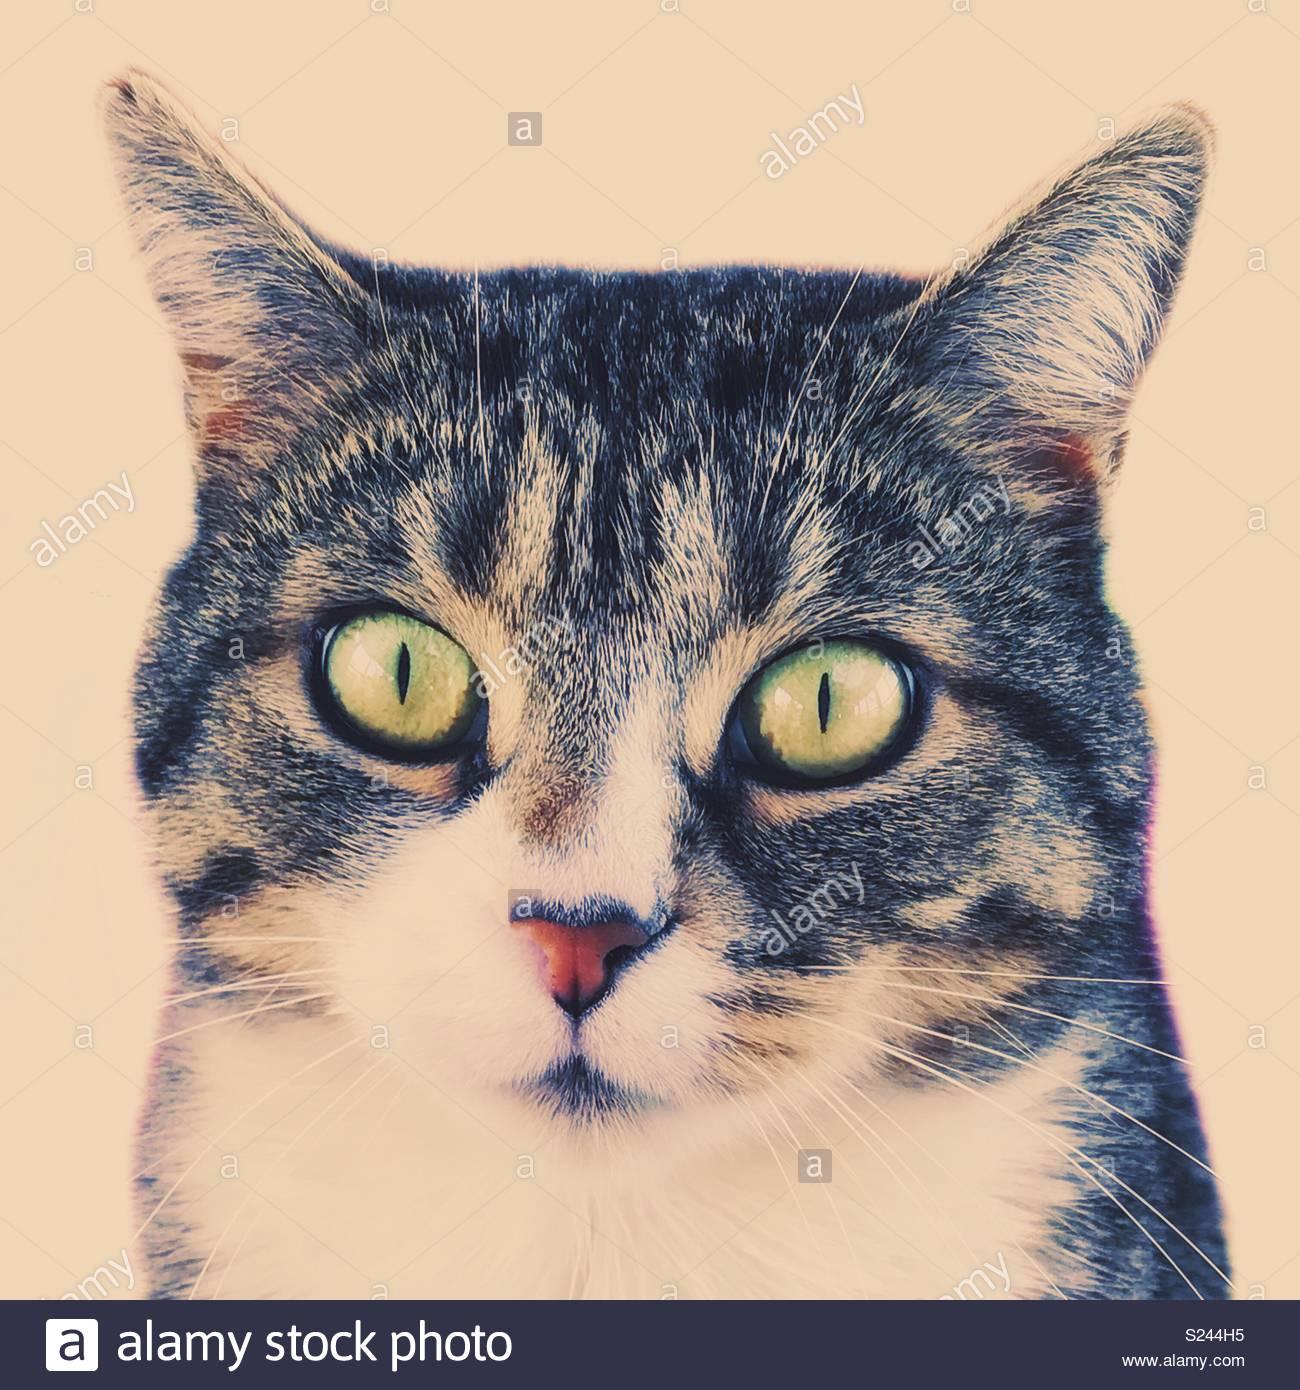 Retrato de un gato atigrado gris Imagen De Stock